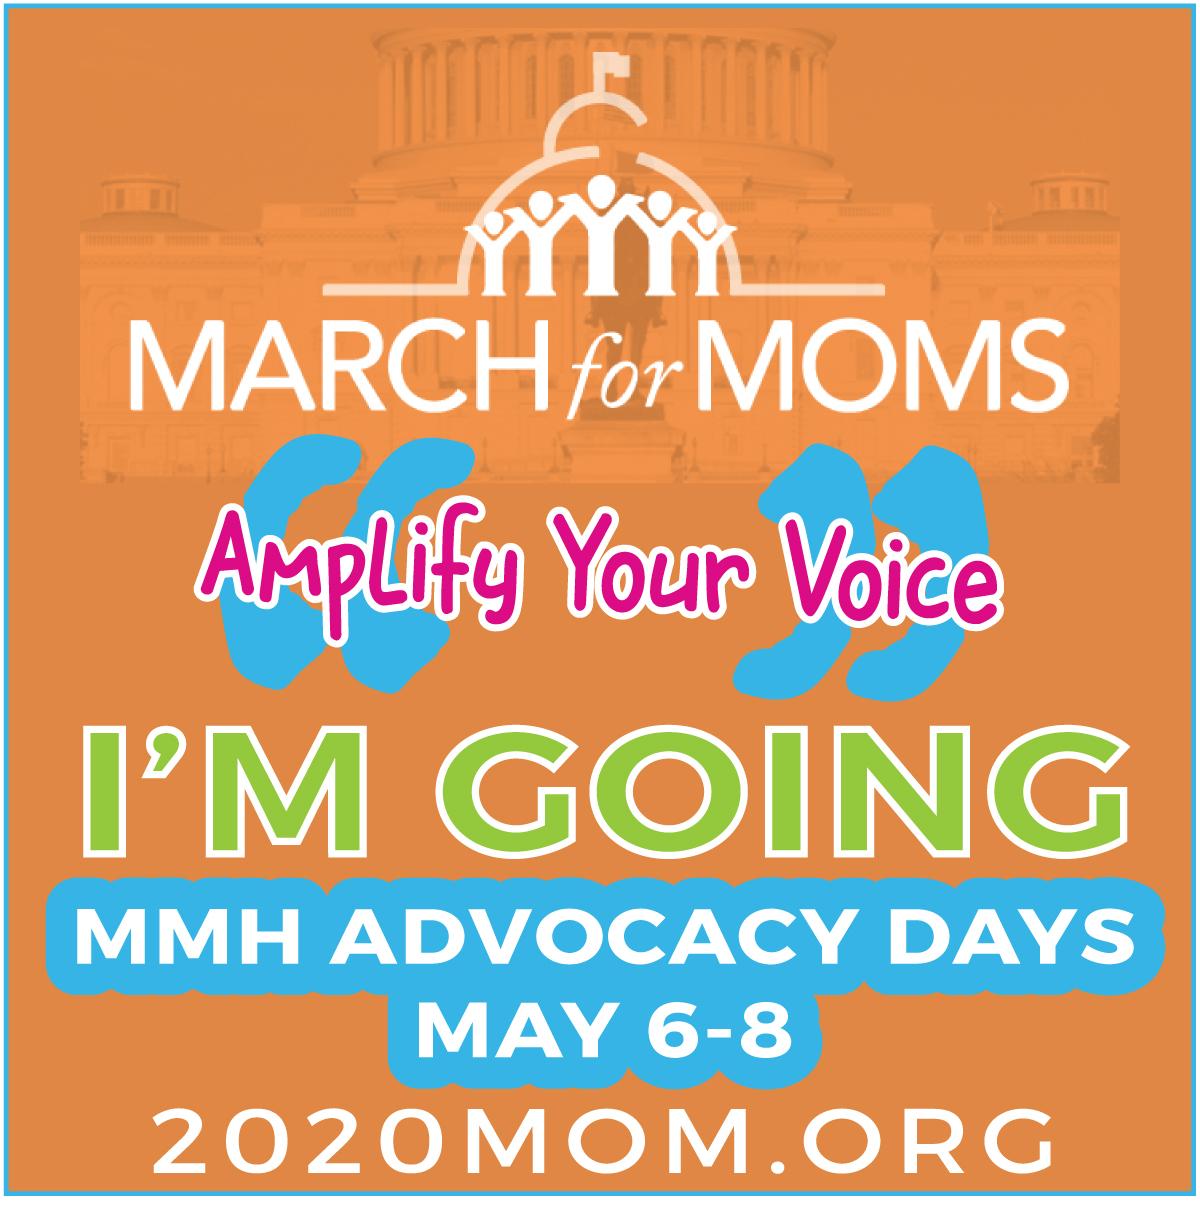 IM-GOING-Advocacy-FBprofile2018V3.jpg